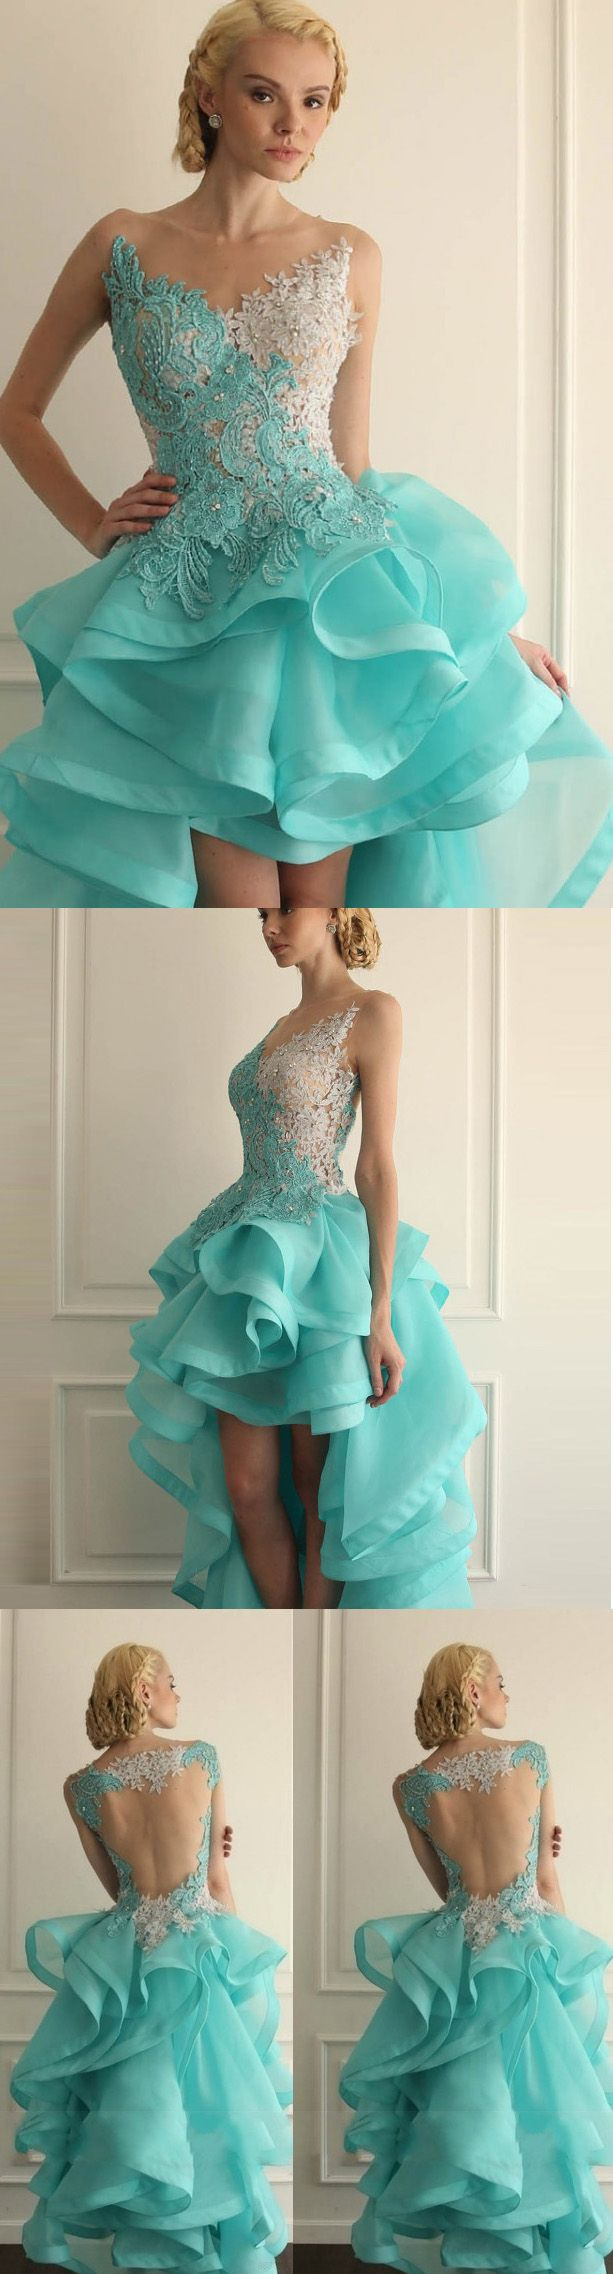 Light blue prom dresses short homecoming dresses prom dresses high